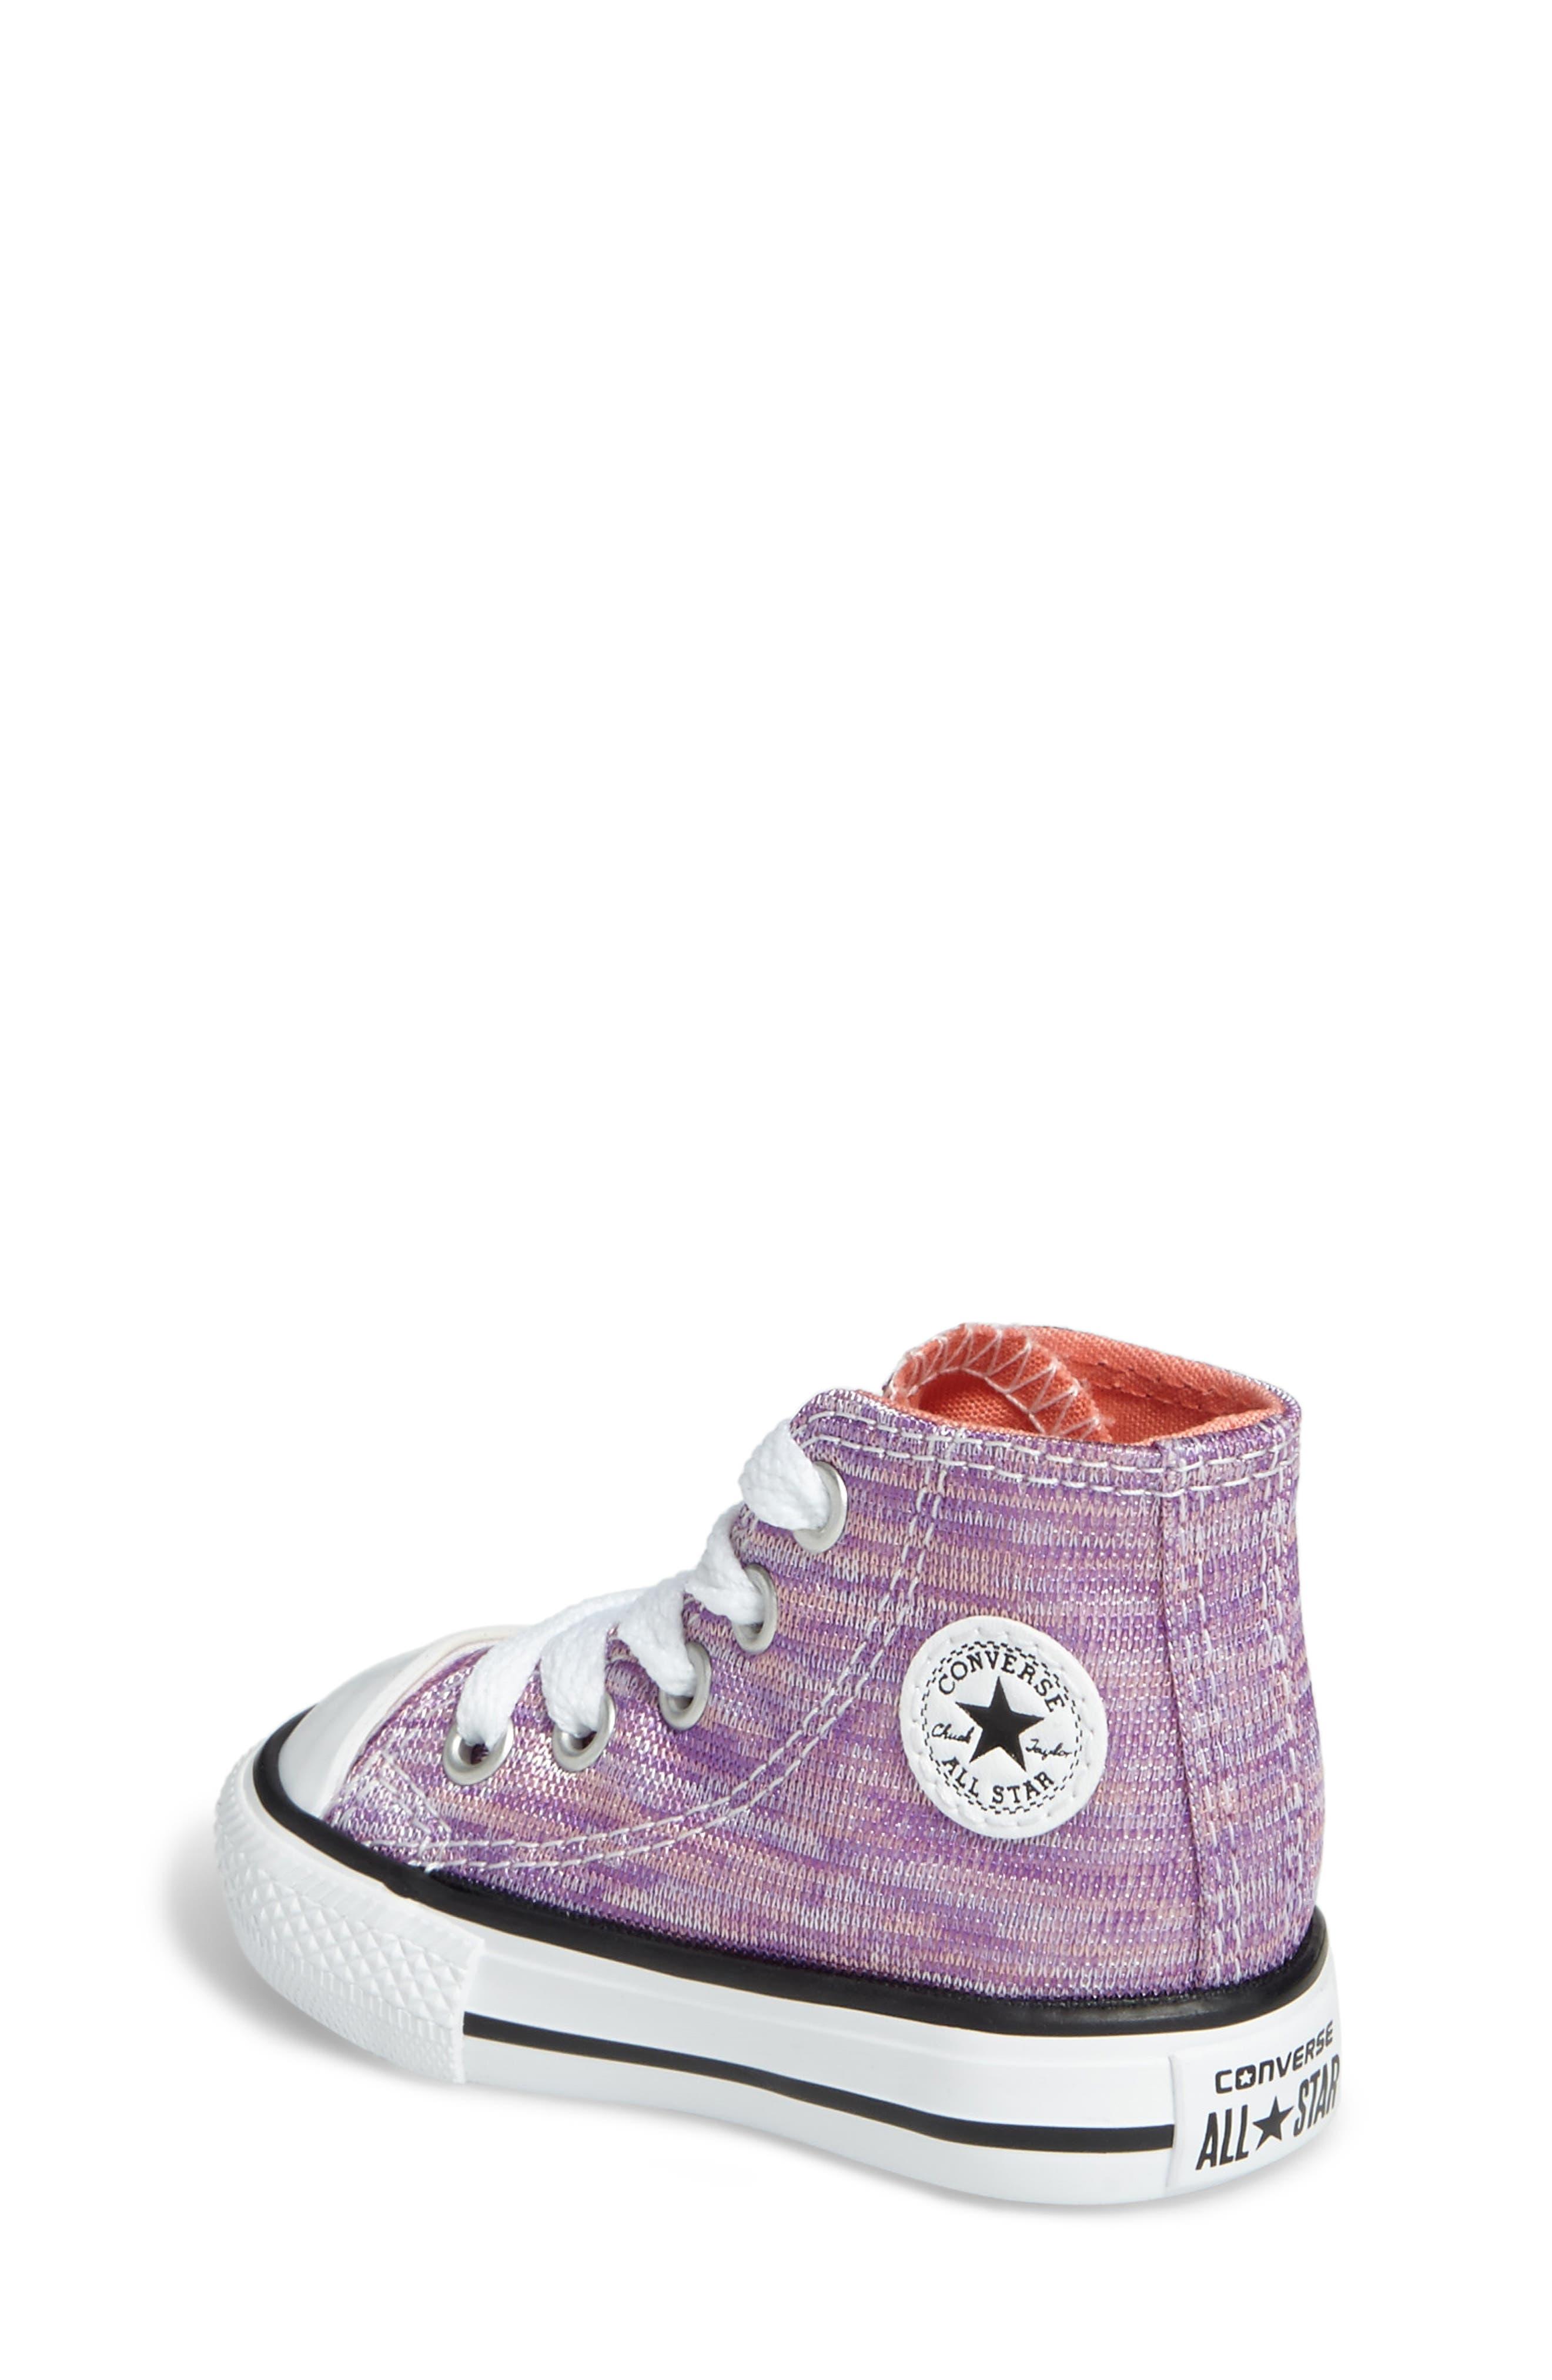 Alternate Image 2  - Converse Chuck Taylor® All Star® Knit High Top Sneaker (Baby, Walker, Toddler & Little Kid)